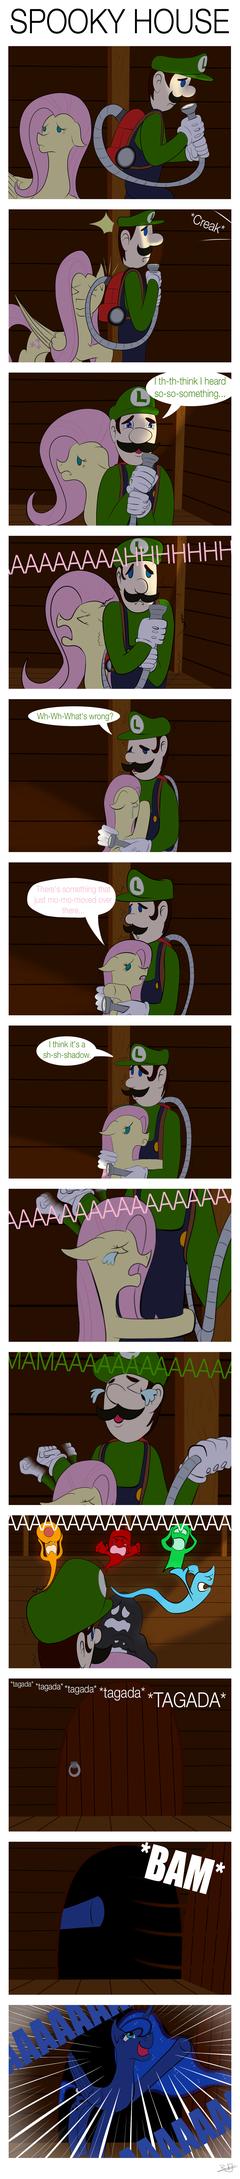 [Comic] Spooky House